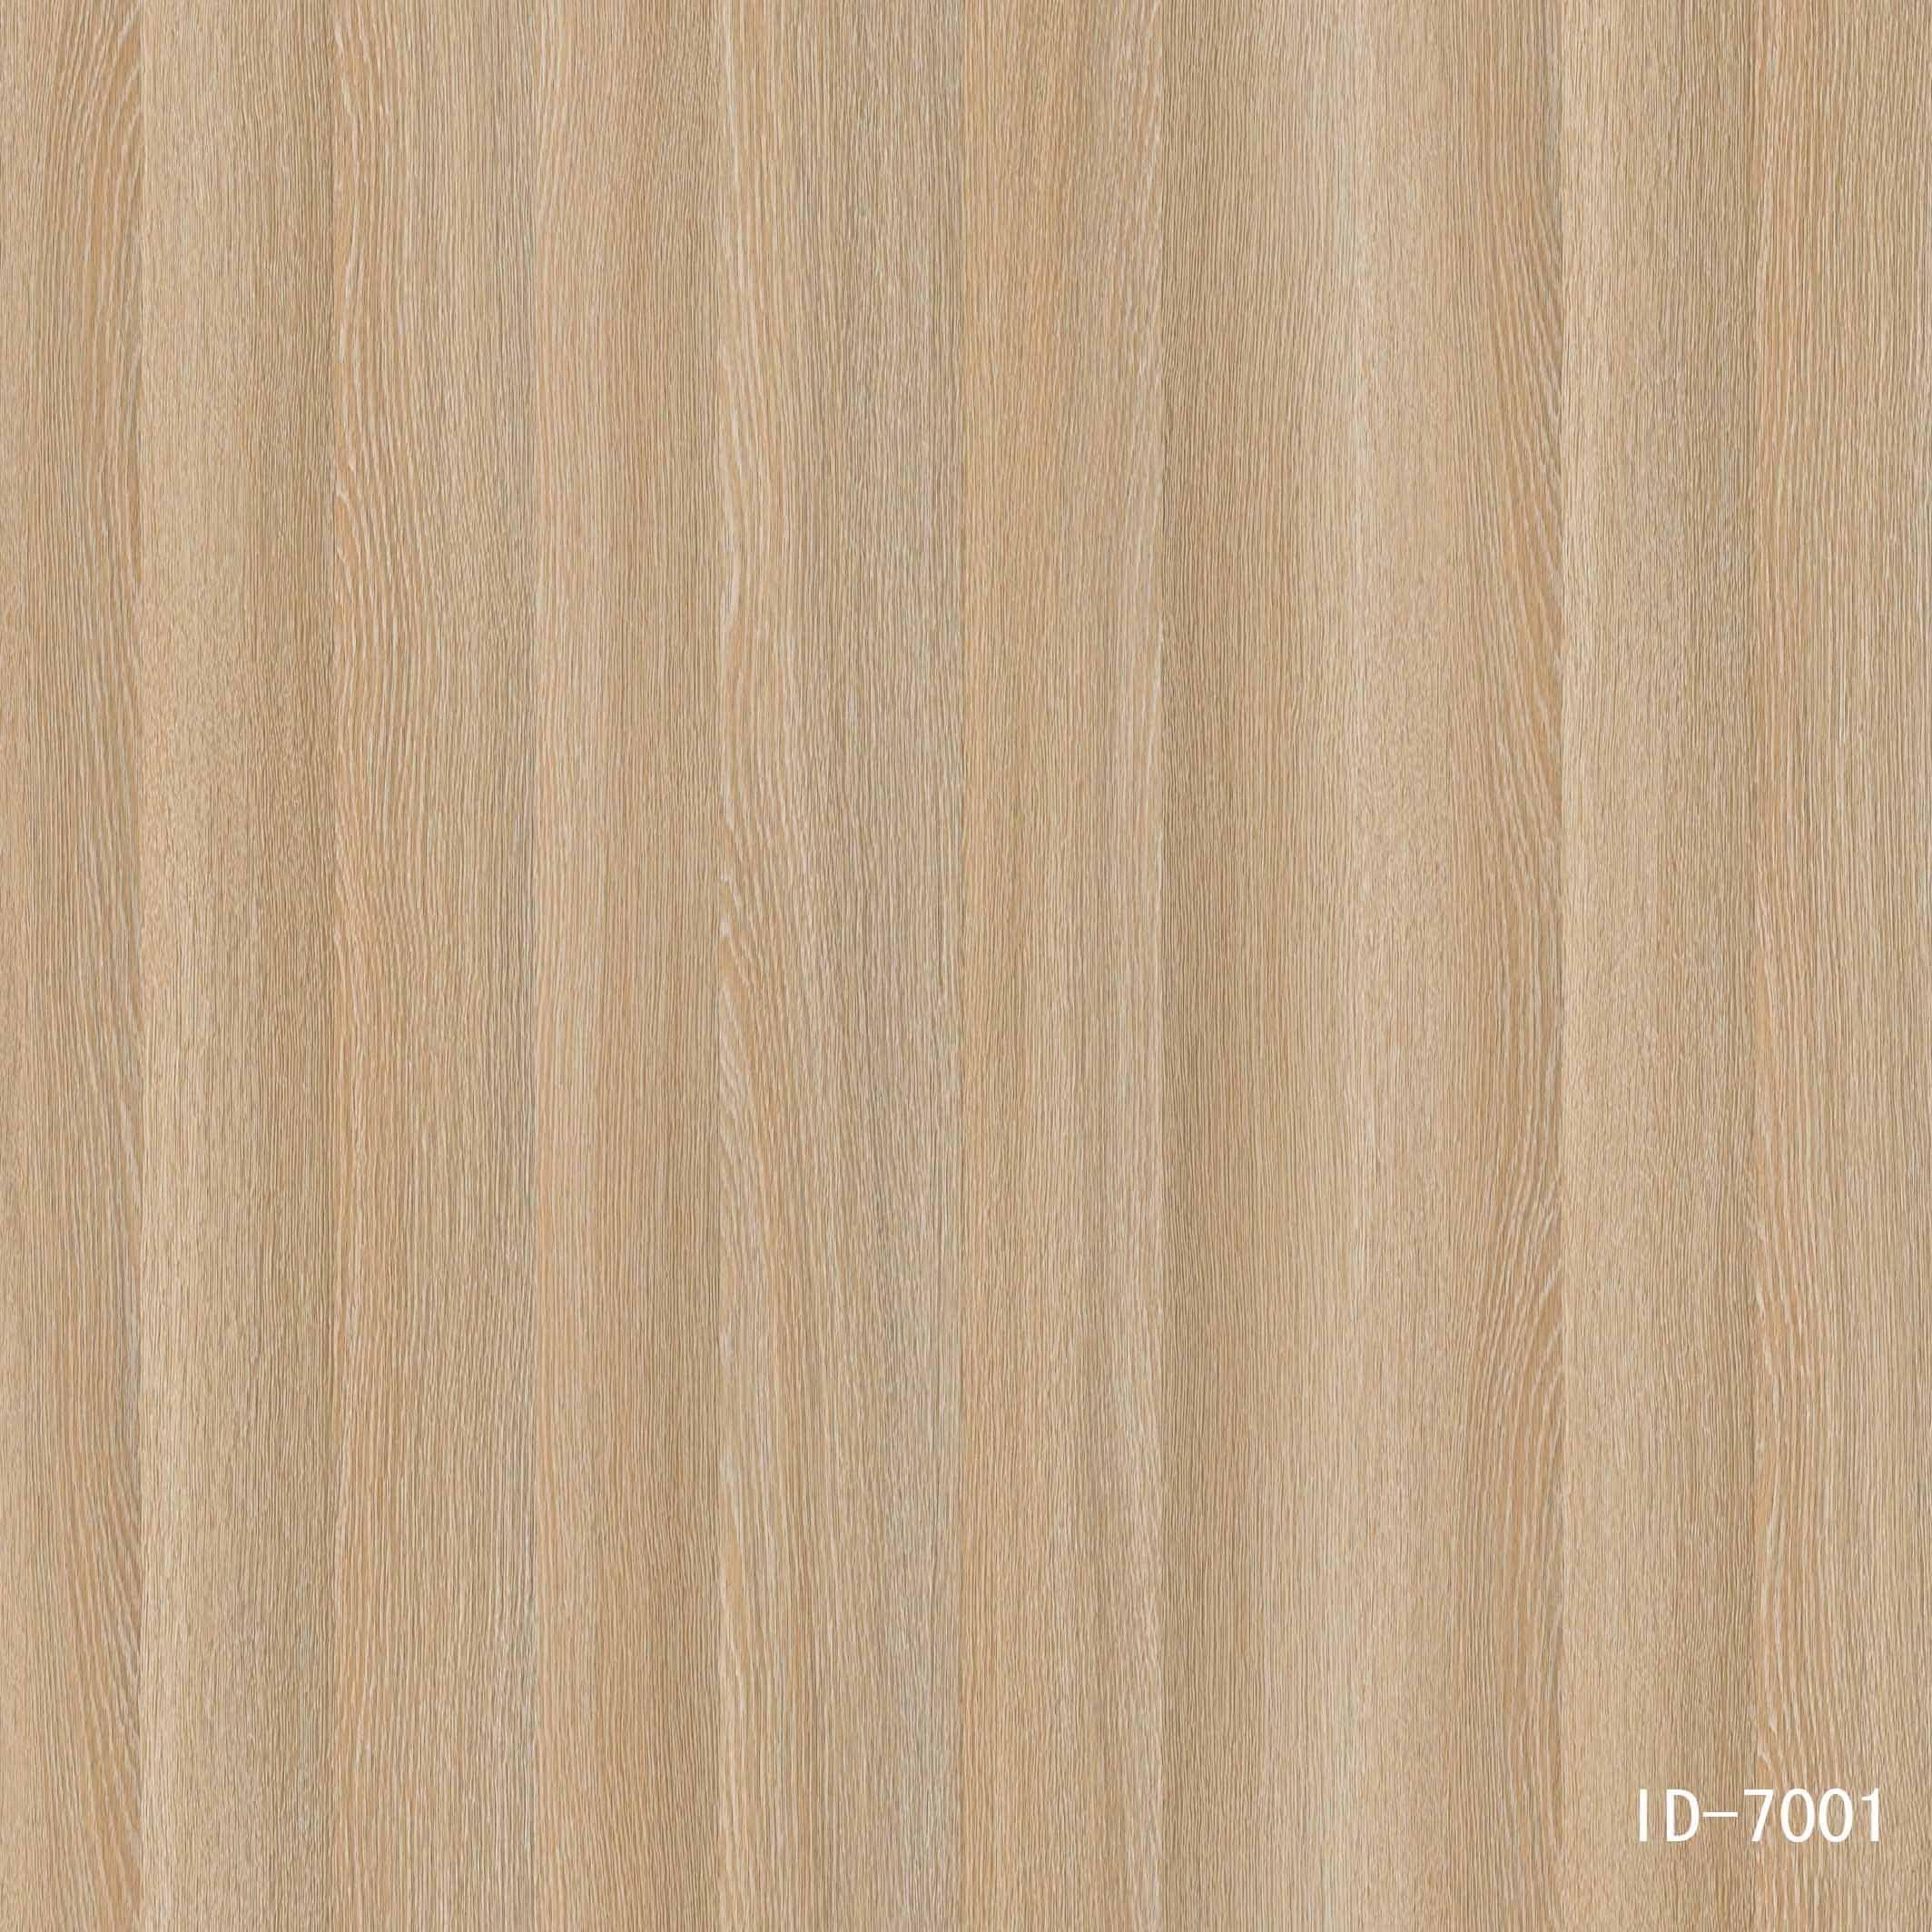 I.DECOR ID-7001 Oak up to 7 feet ID Series 2013 image72